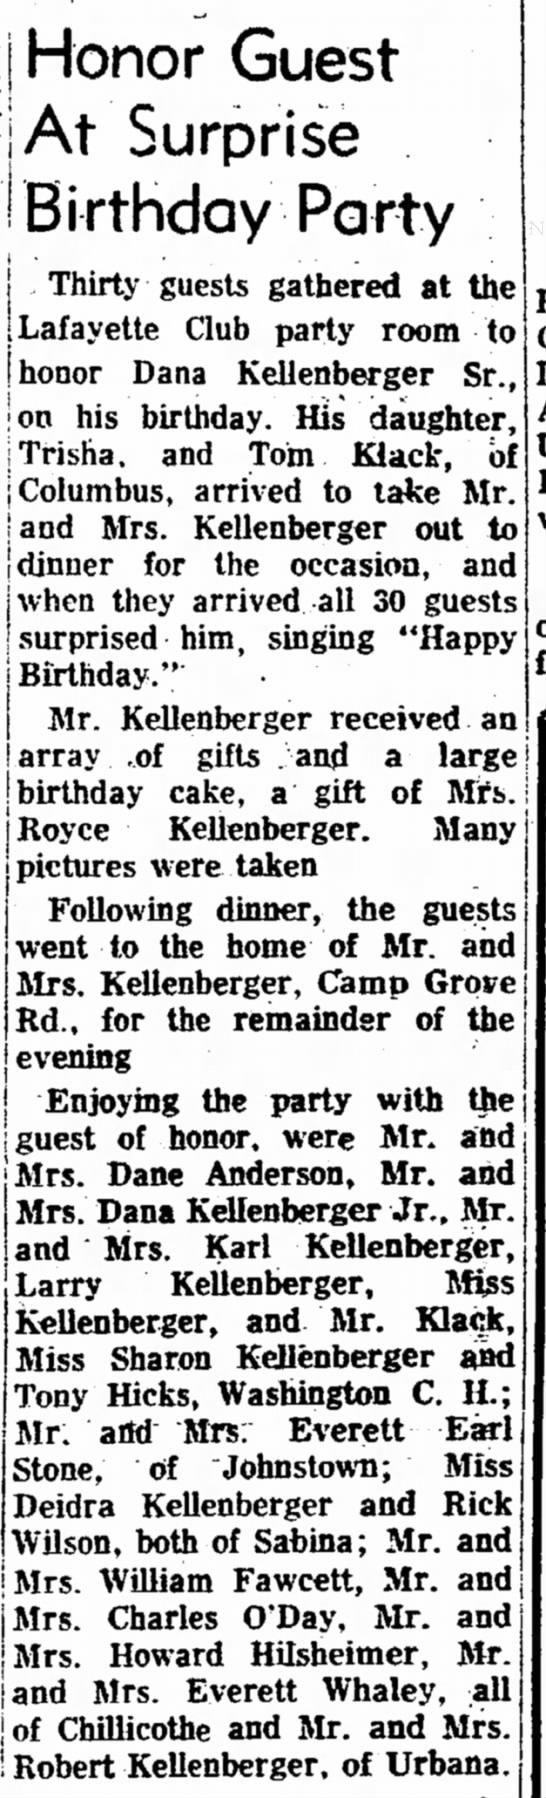 Hilsheimer_Howard_24apr1969 - Honor Guest j /ikj- ^ . . Birthday Party - ,...